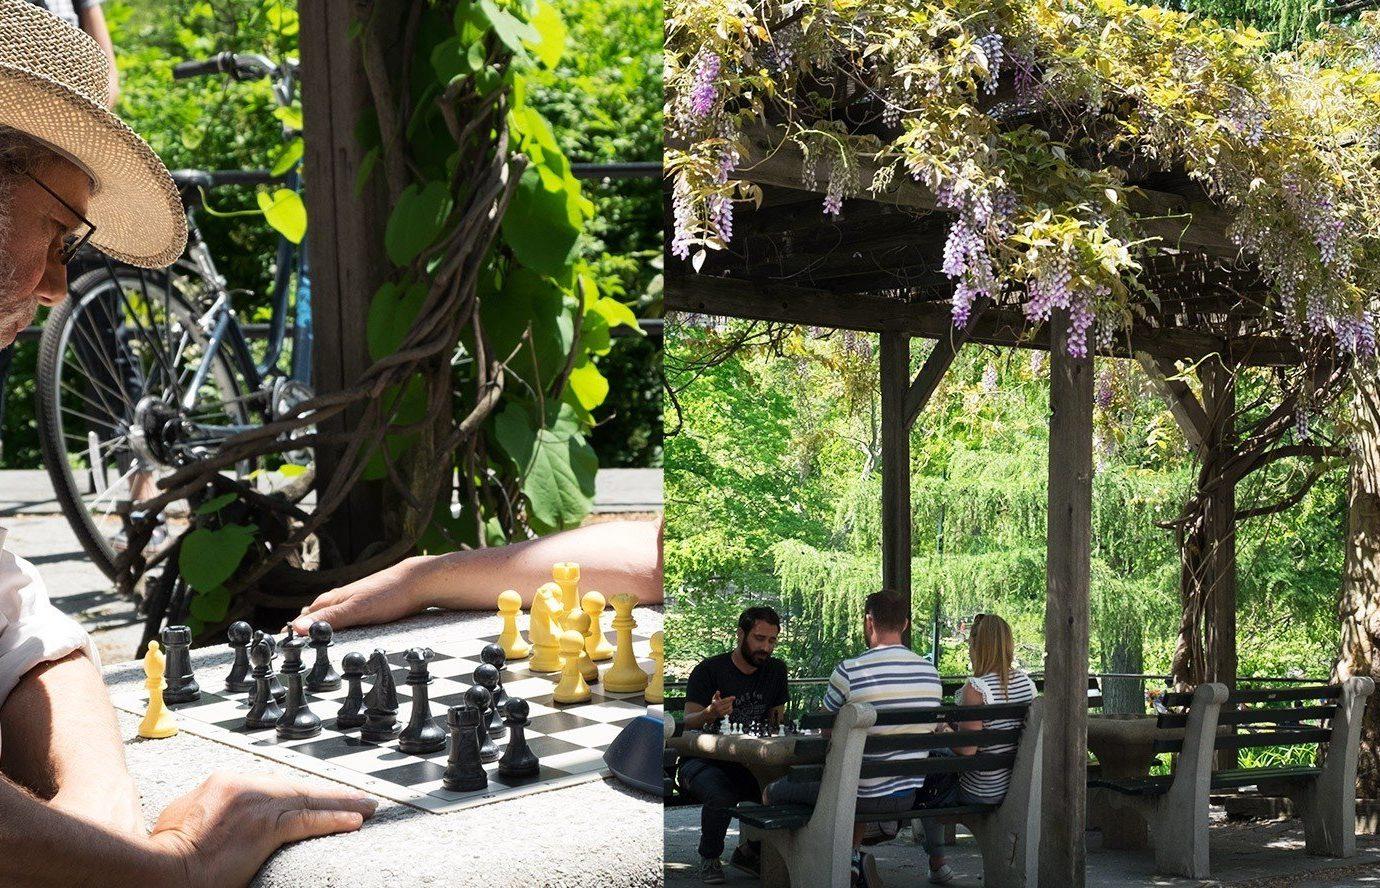 Travel Tips tree outdoor person flower Garden games restaurant